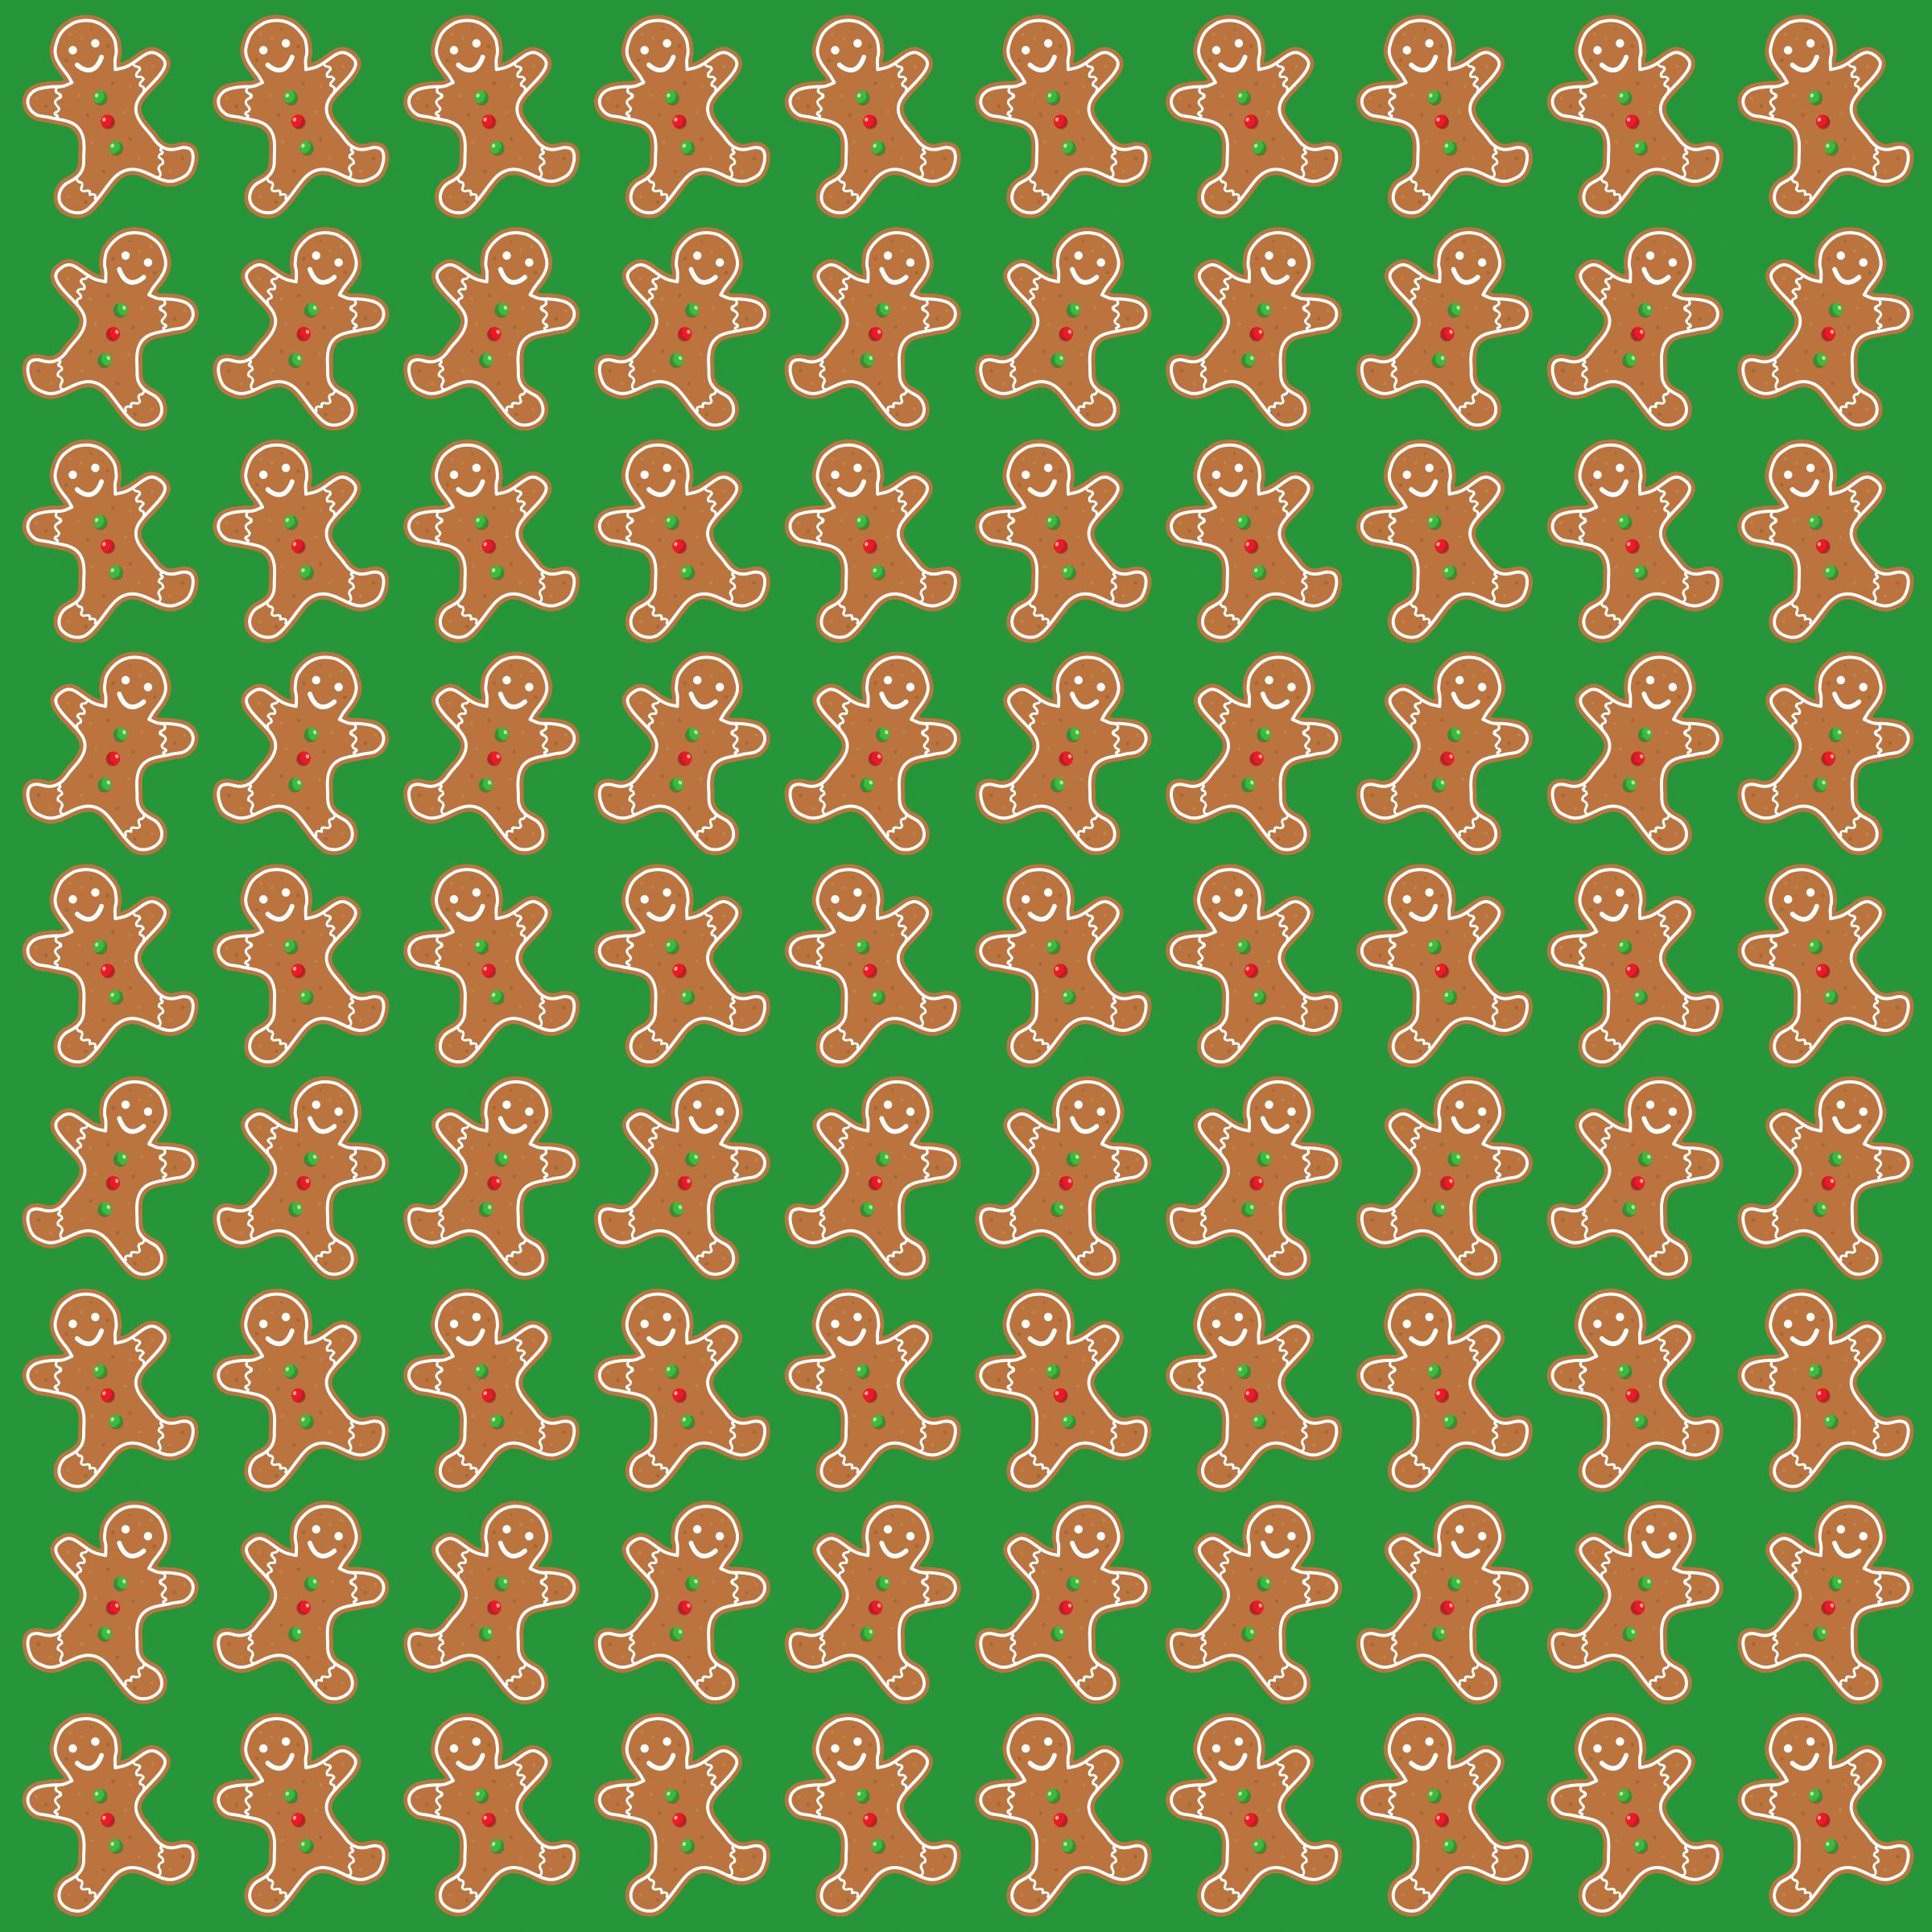 gingerbread-men-green-1